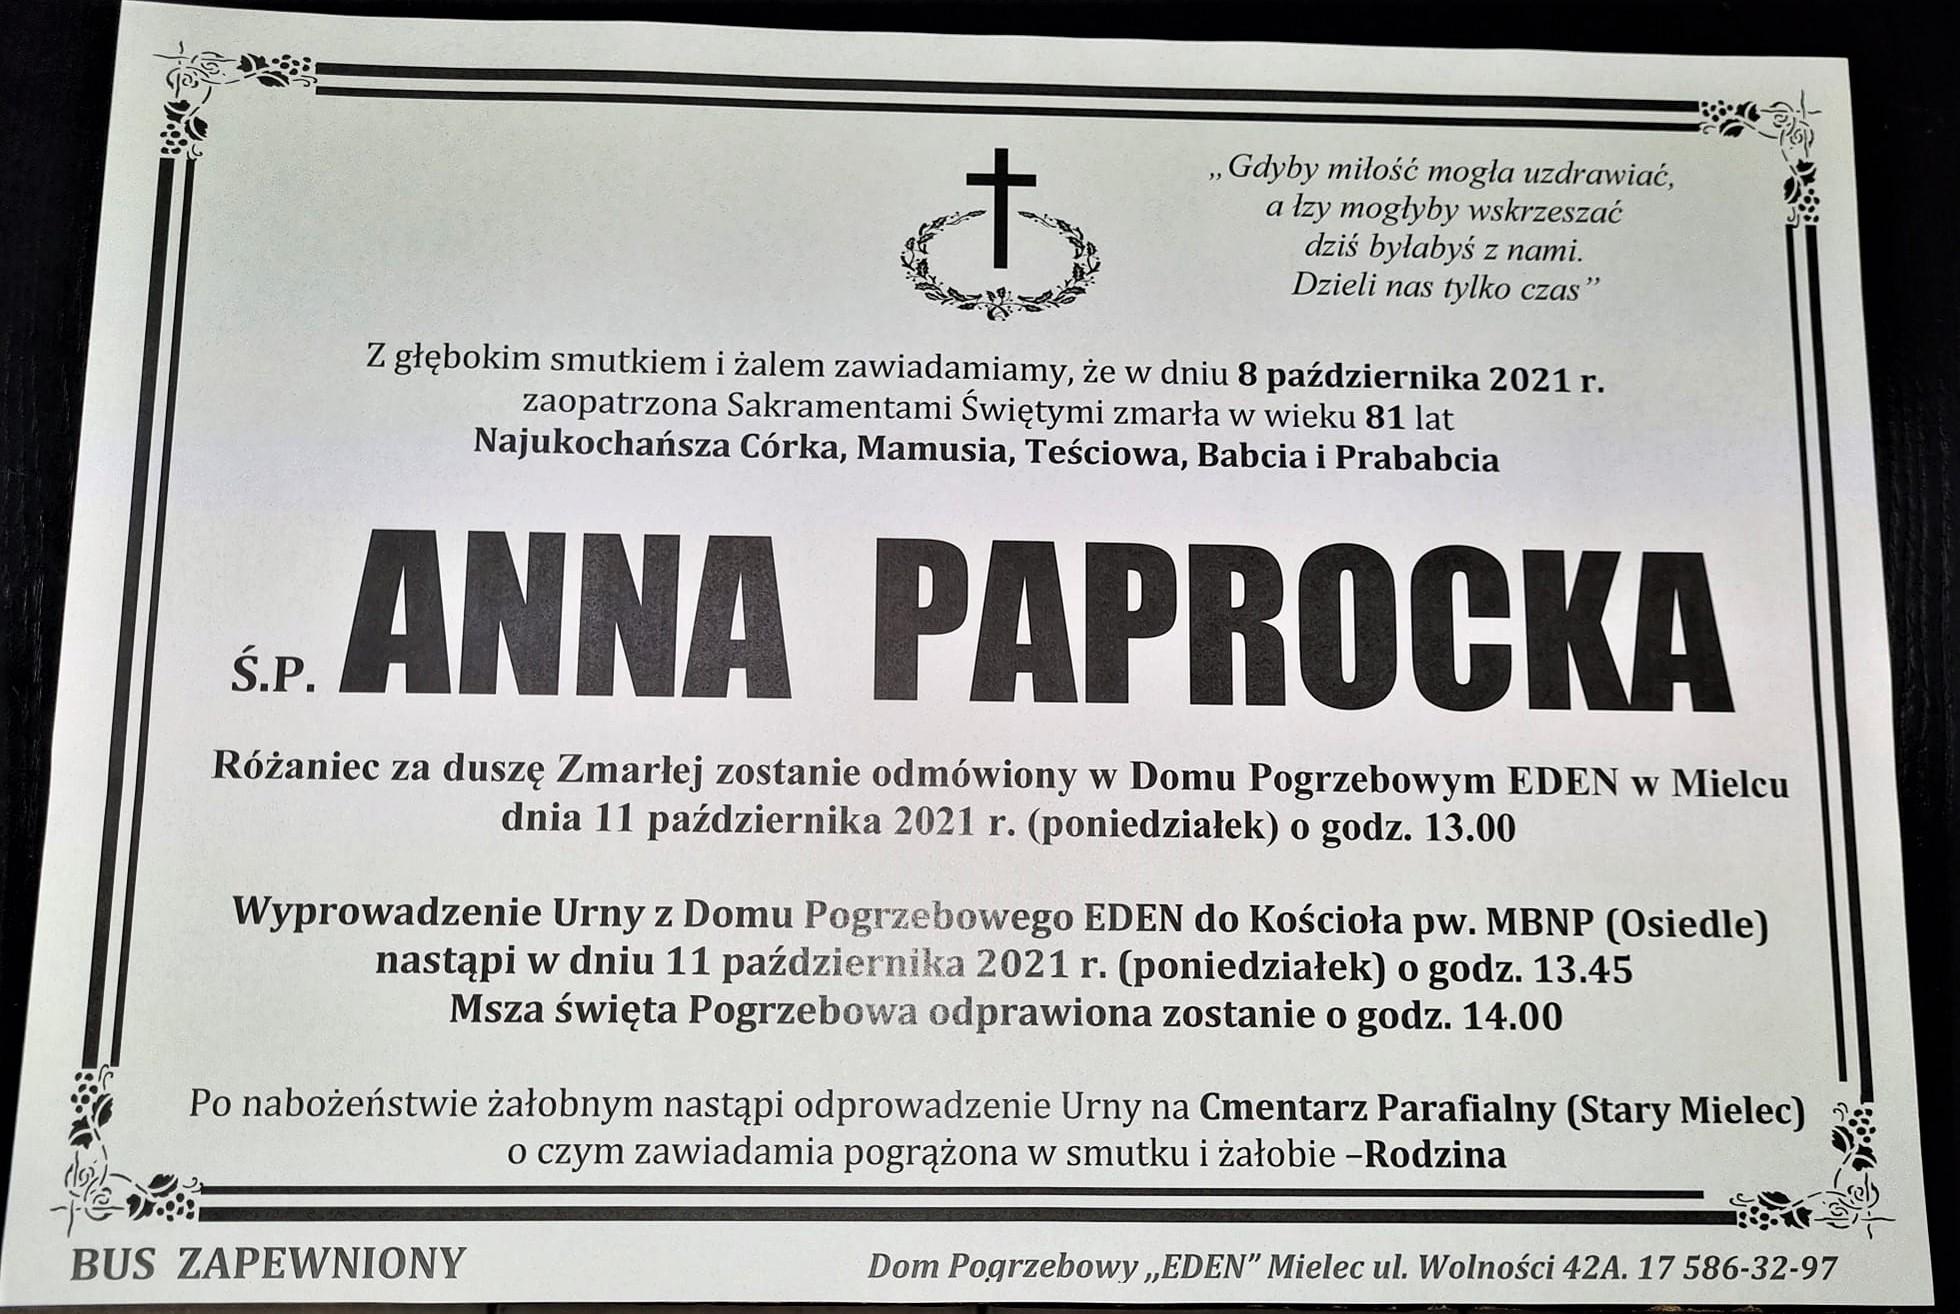 Odeszła Anna Paprocka - najfajniejsza seniorka Mielca